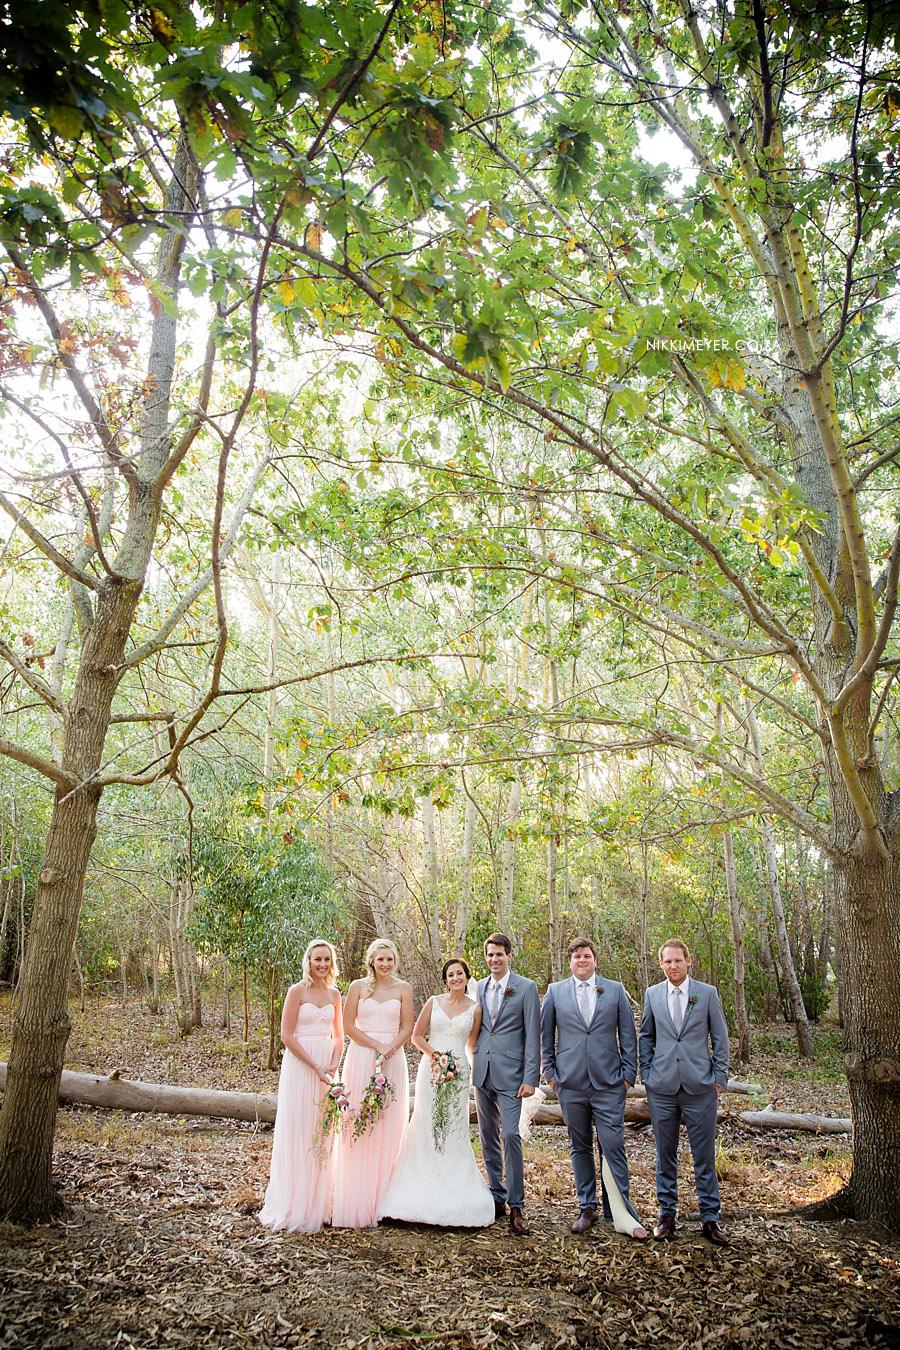 nikki_meyer_wedding_photographer_Cape_Town_031